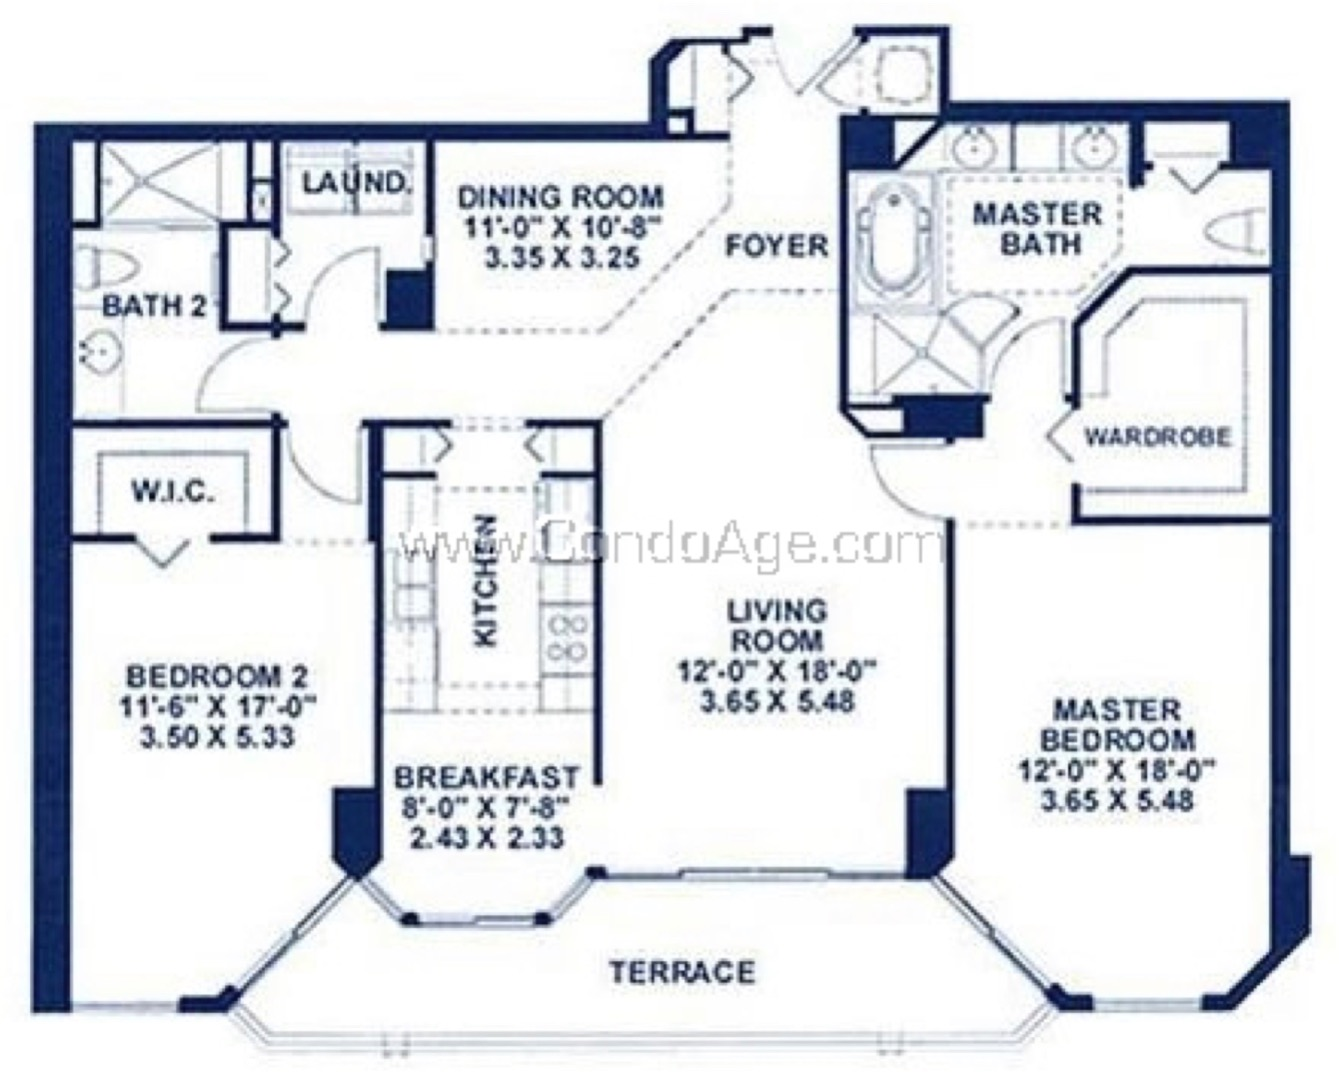 Floor plan image CR - 2/2  - 1505 sqft image